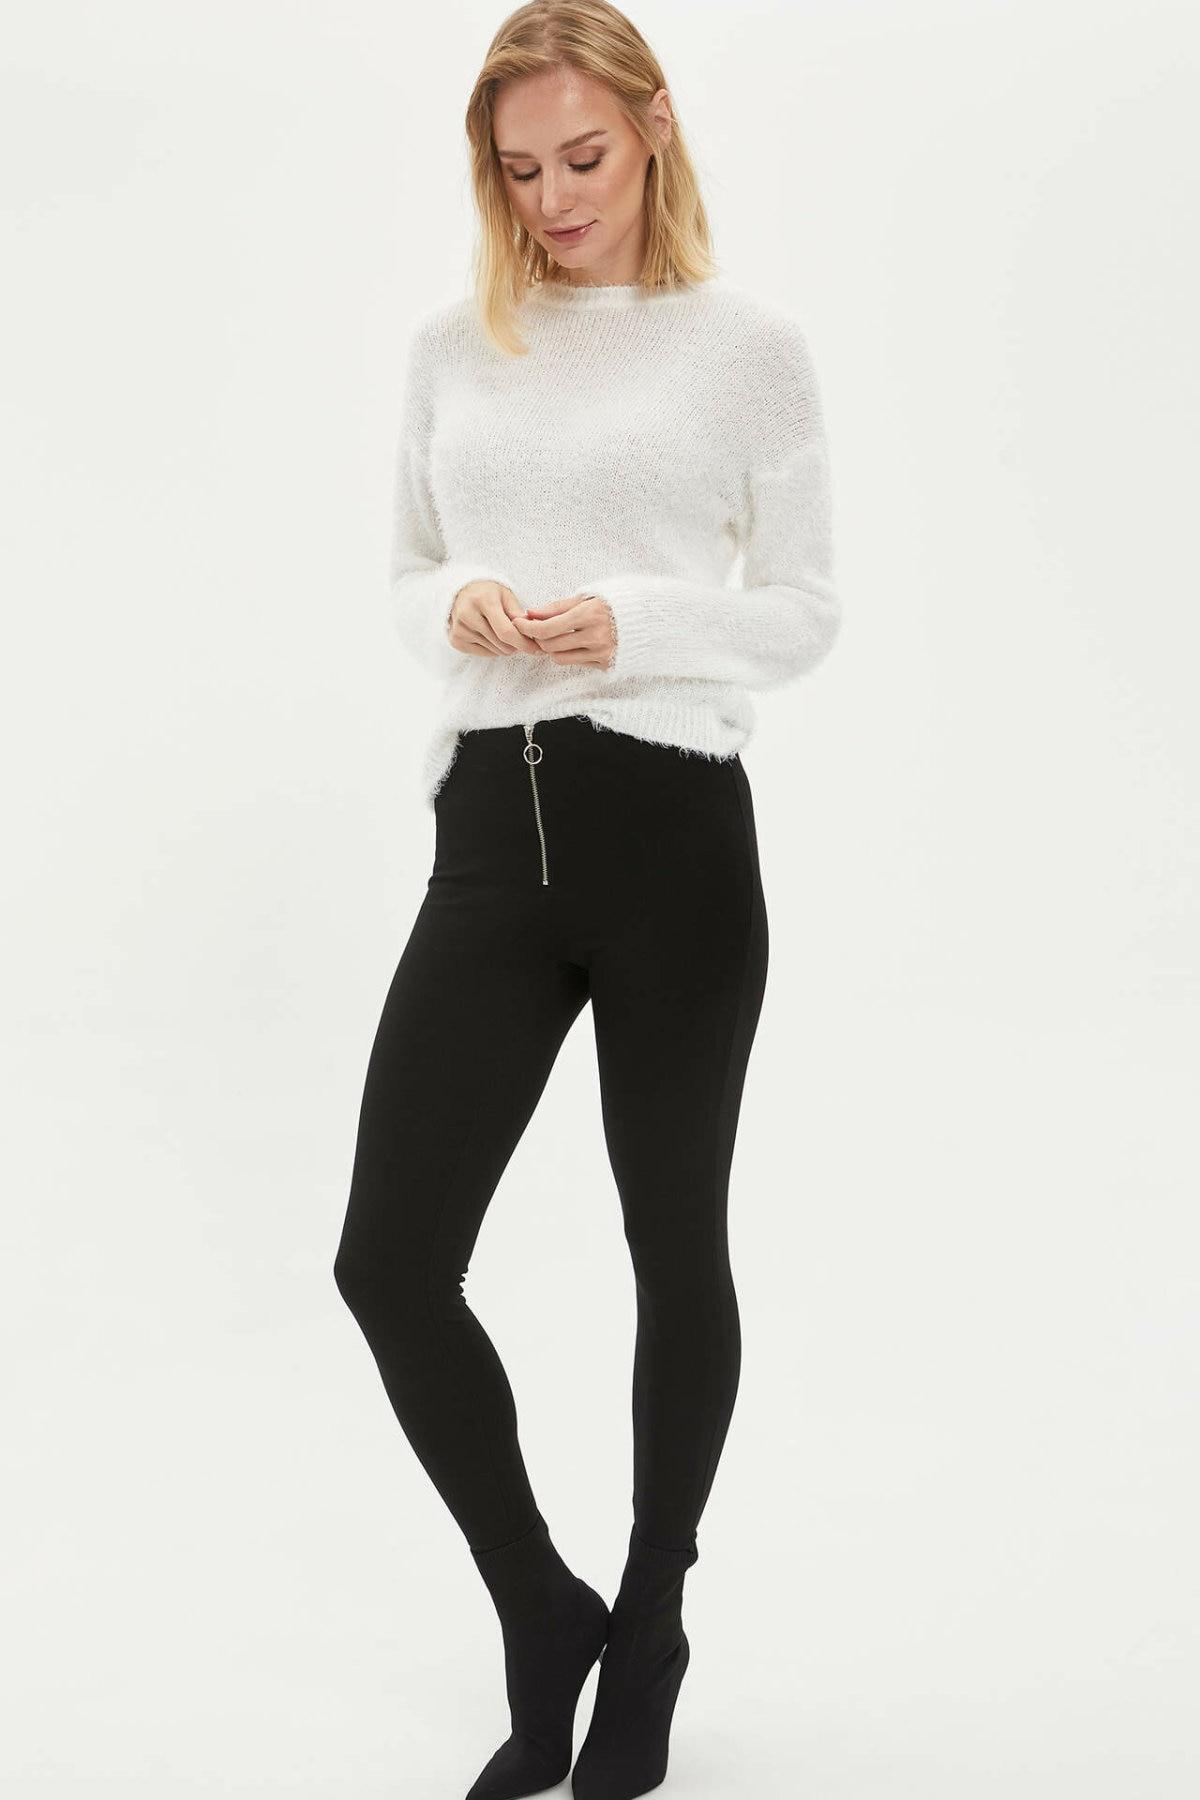 DeFacto Woman Black Slim Legging Pants Women Casual Zipper Decors Leggings Bottoms Female Skinny Pants-K7644AZ20SP